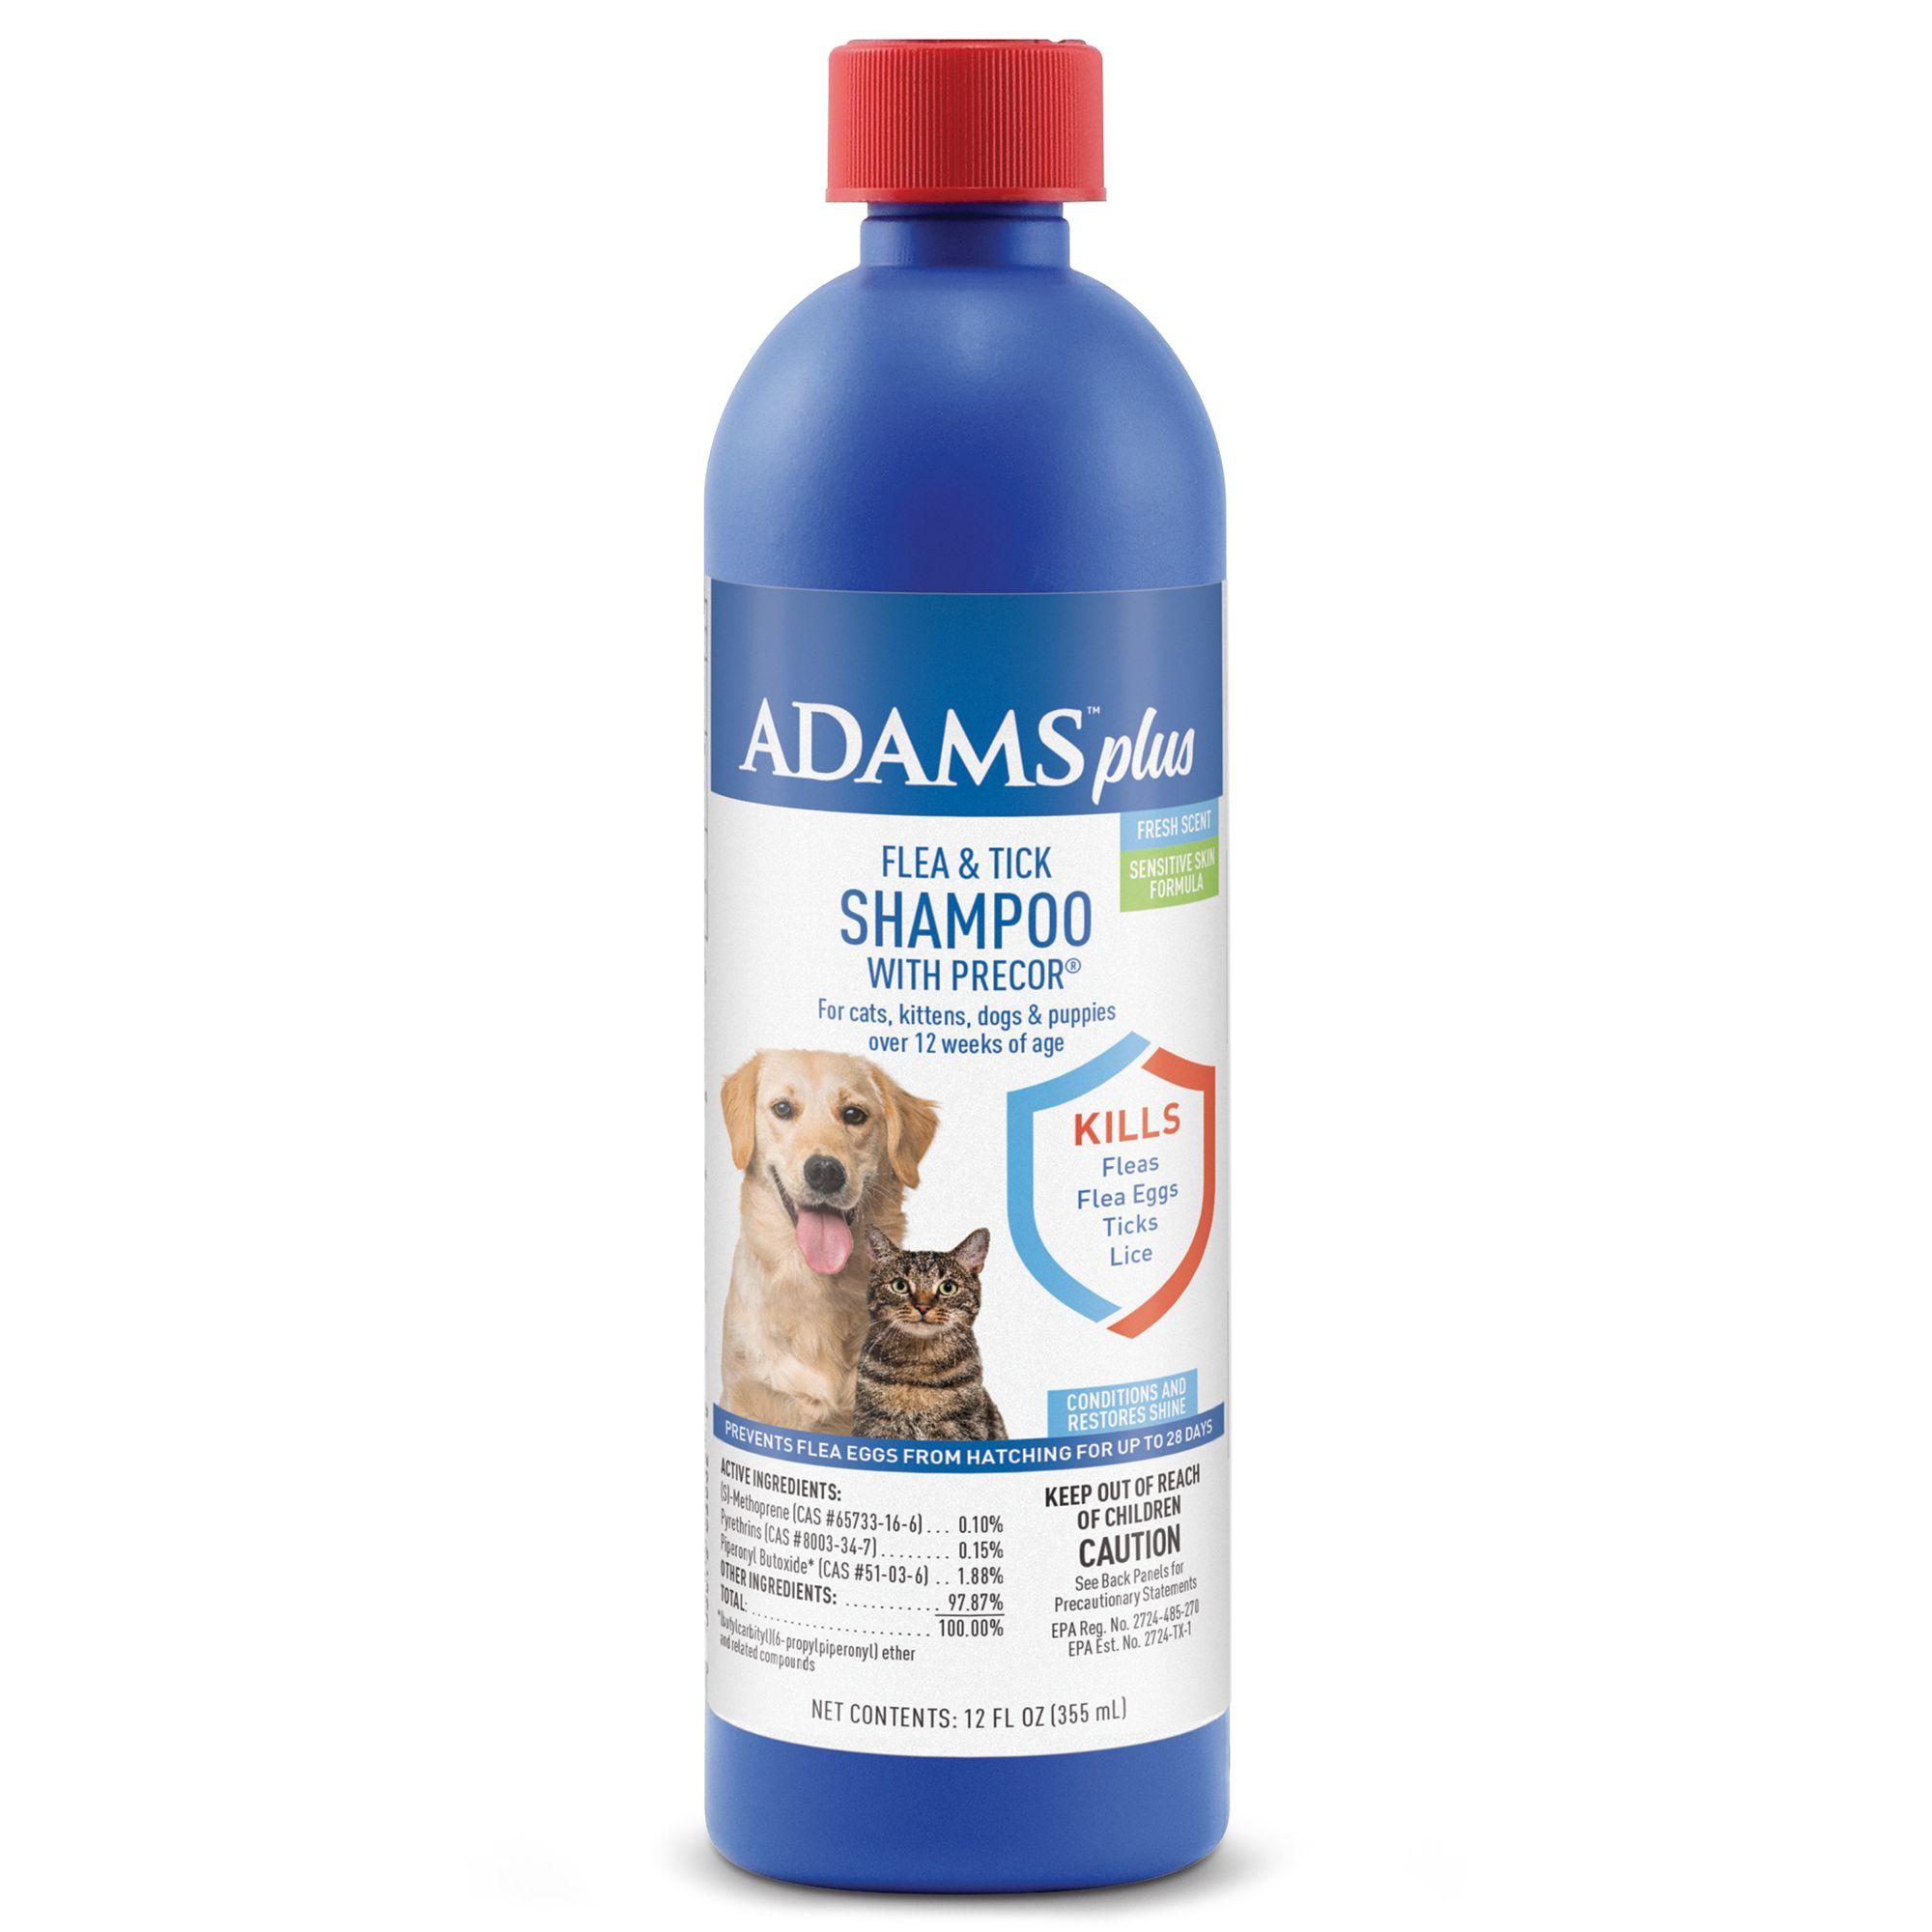 Adams Plus Flea And Tick Shampoo